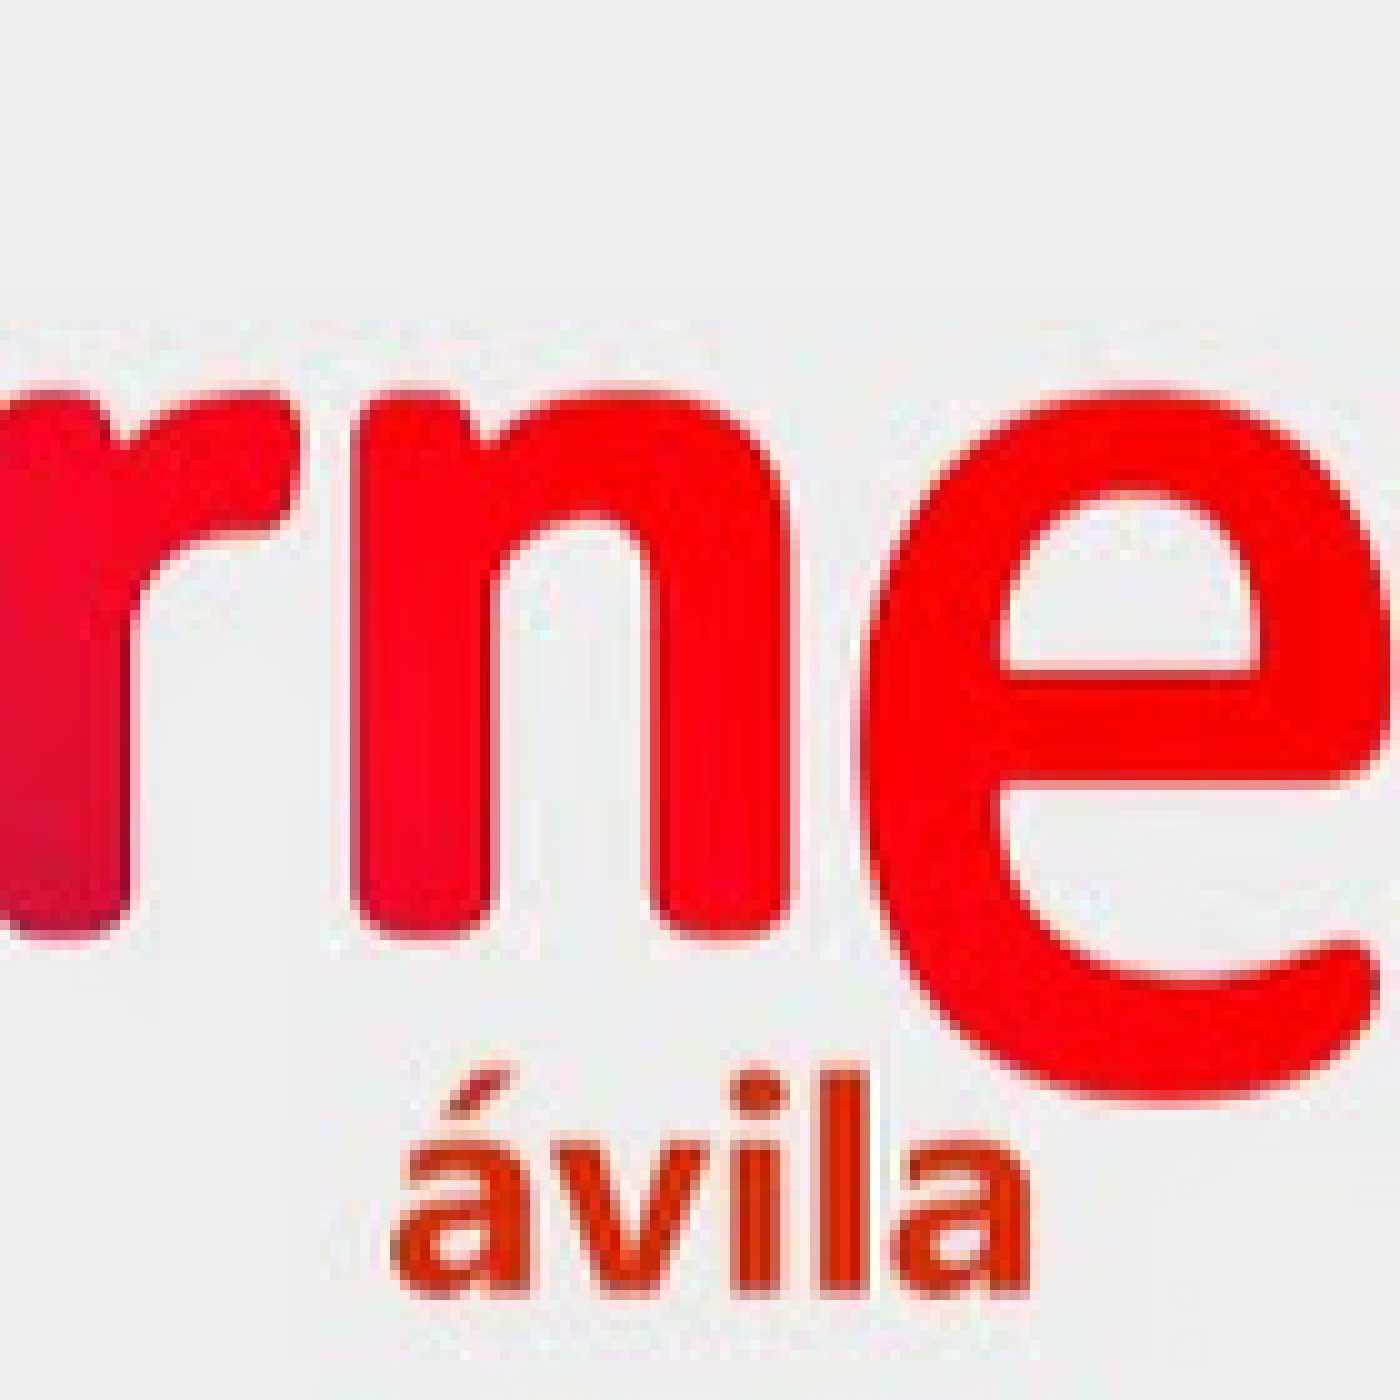 Informativo Ávila - 10/03/2020 - Escucgar ahora